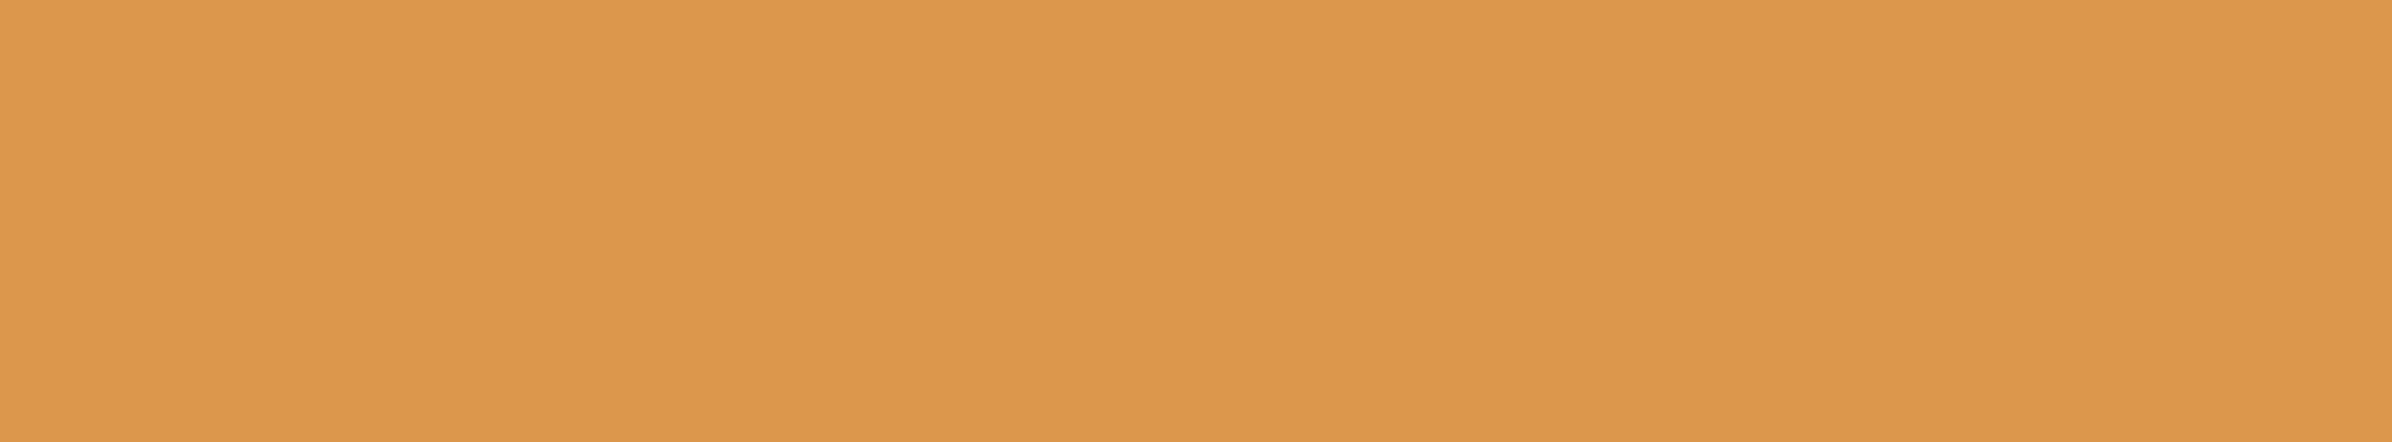 #1113 @ 5% - White